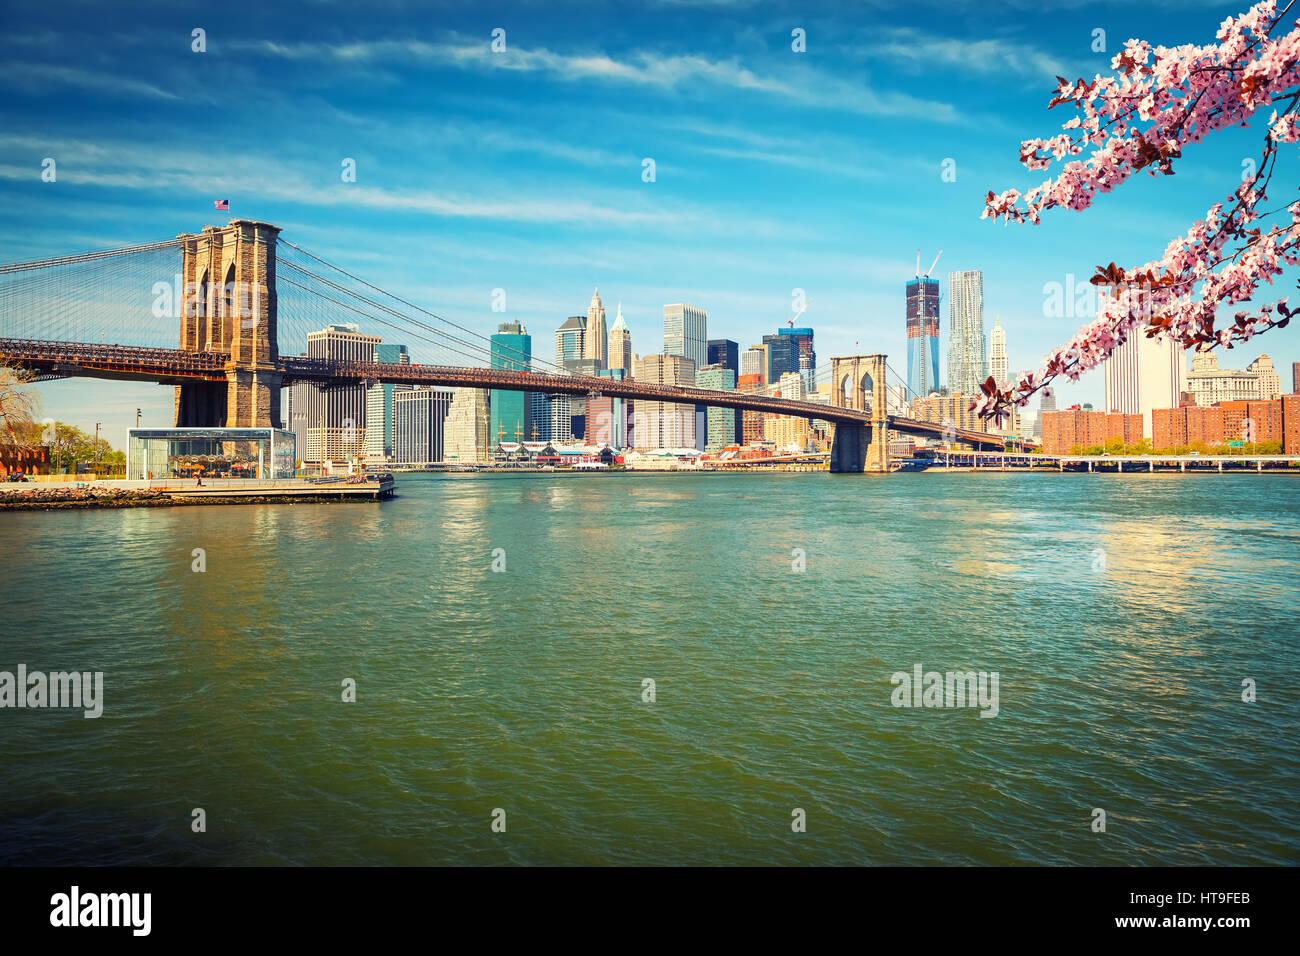 Pont de Brooklyn et Manhattan au printemps, New York City Photo Stock